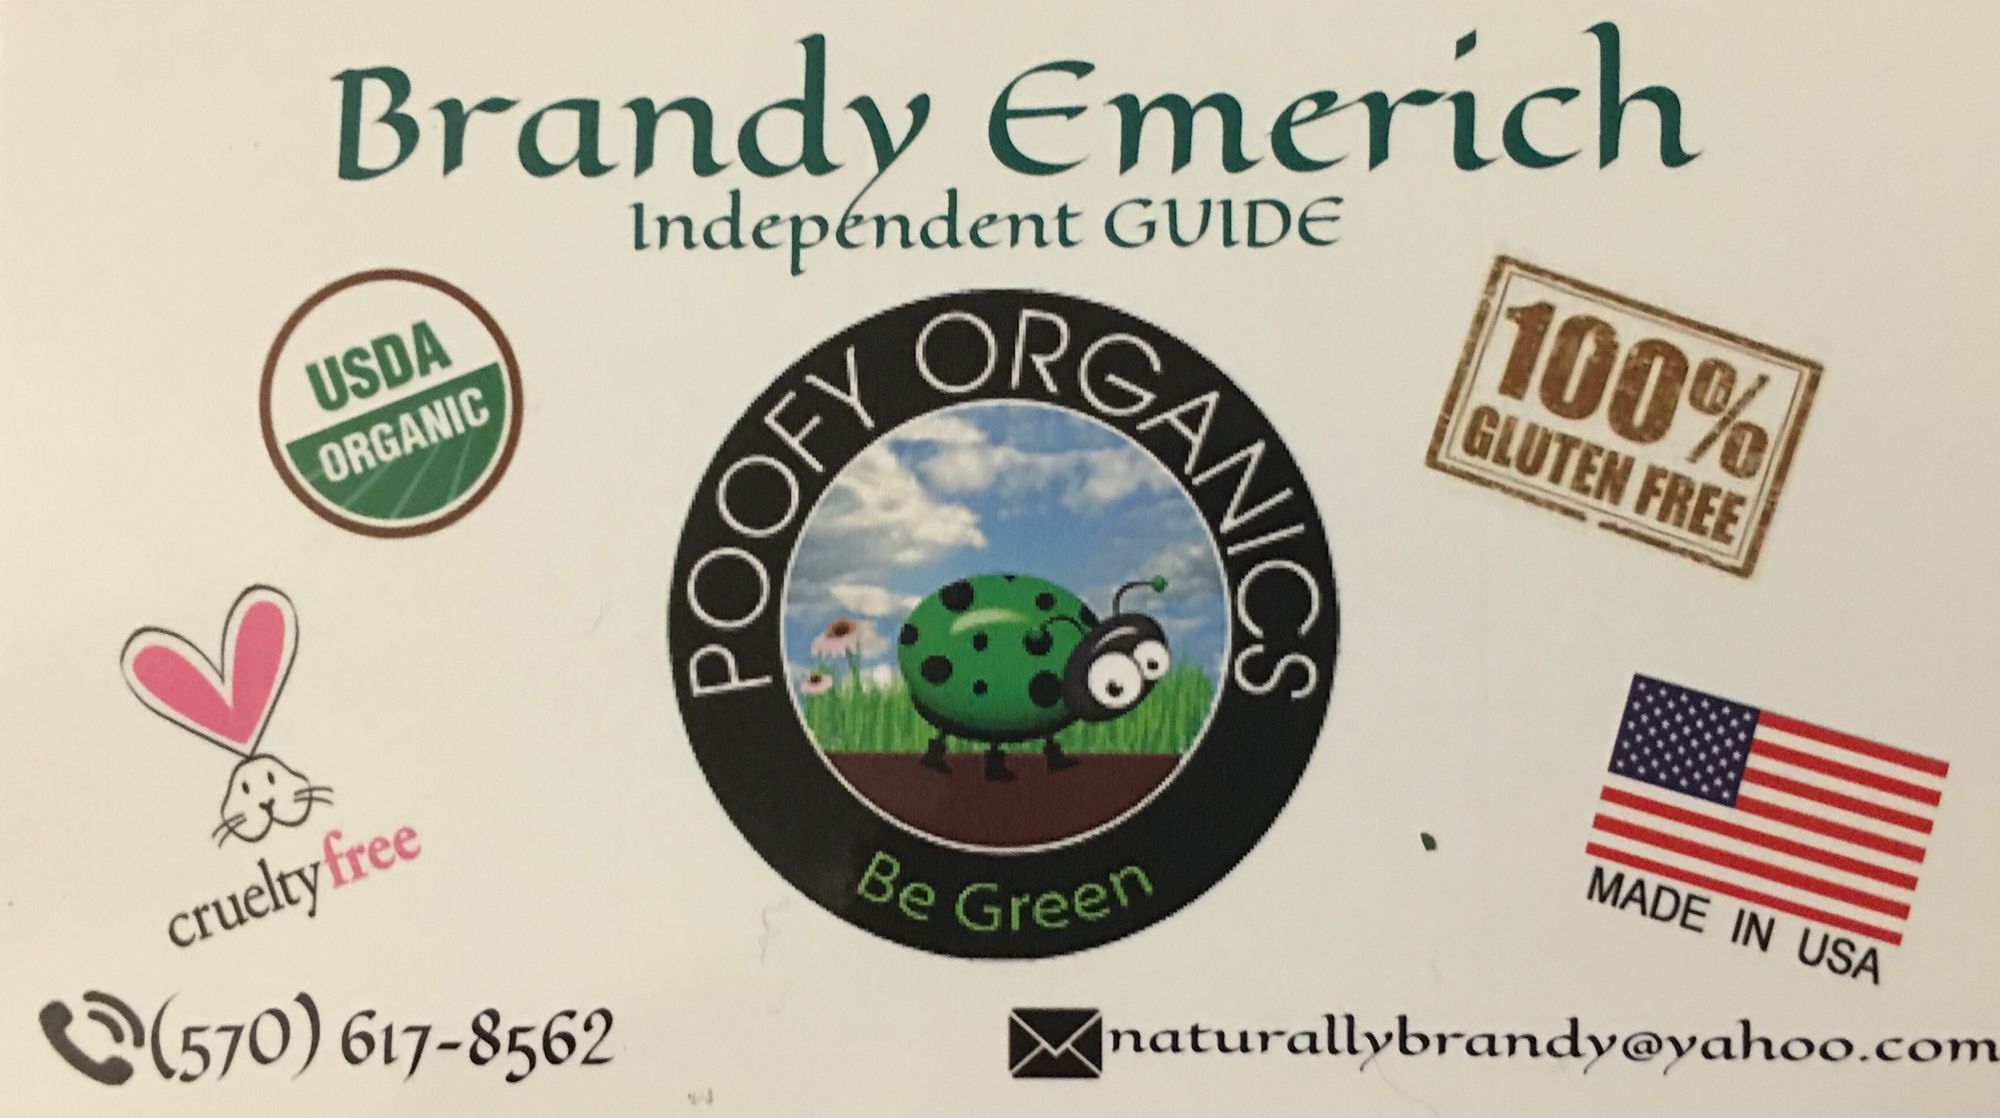 Poofy Organics Business Card Naturallybrandy Poofyorganics Com